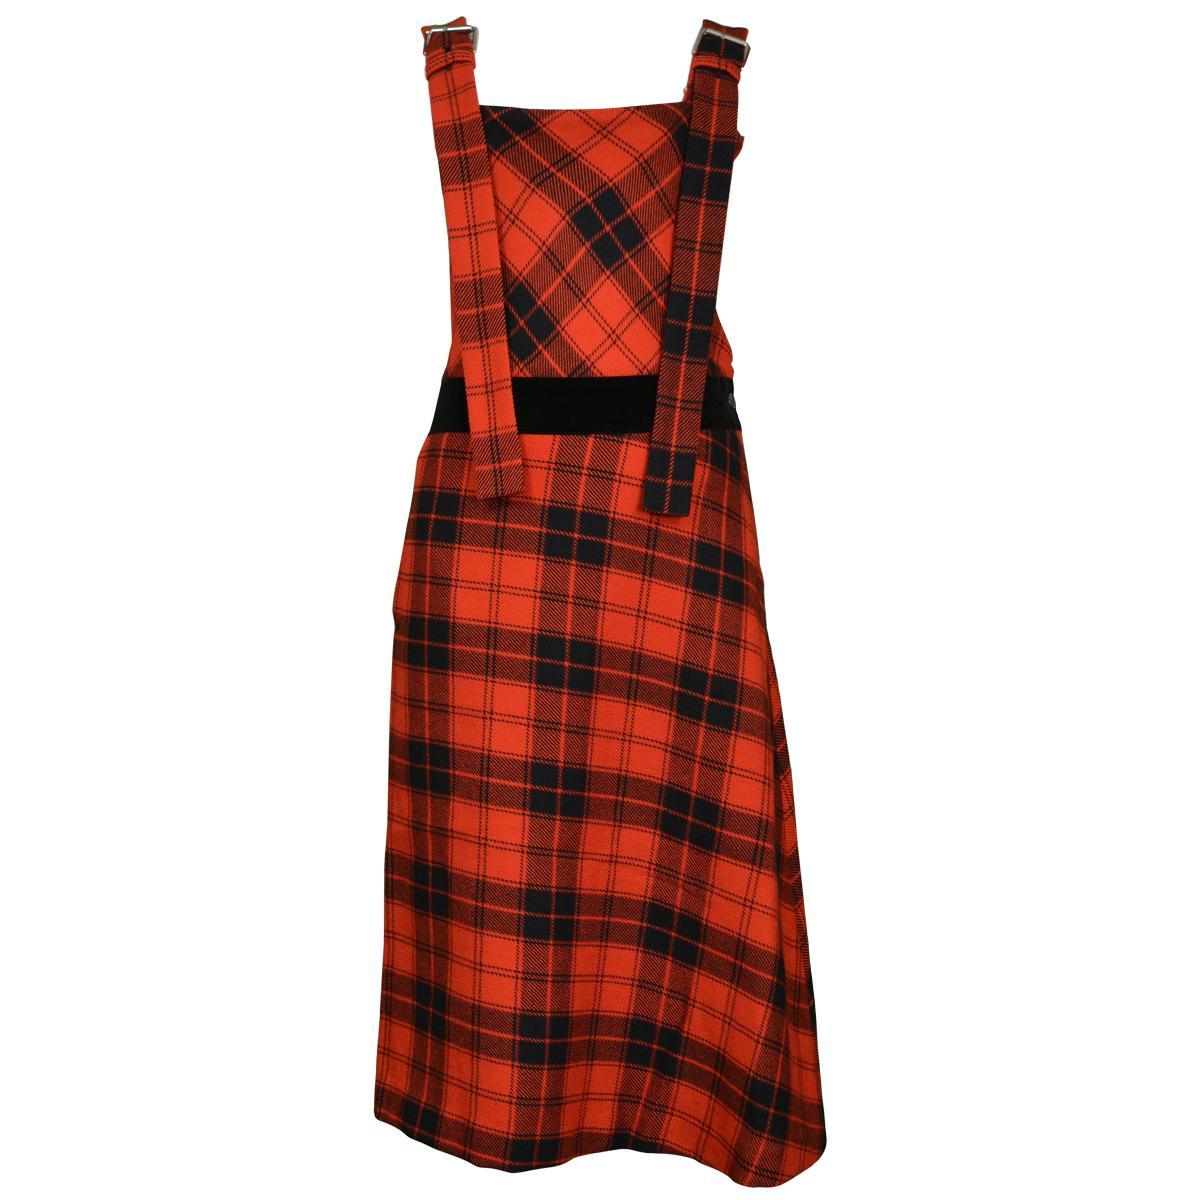 Vintage Yohji Yamamoto Red Plaid Jumper Dress 2003